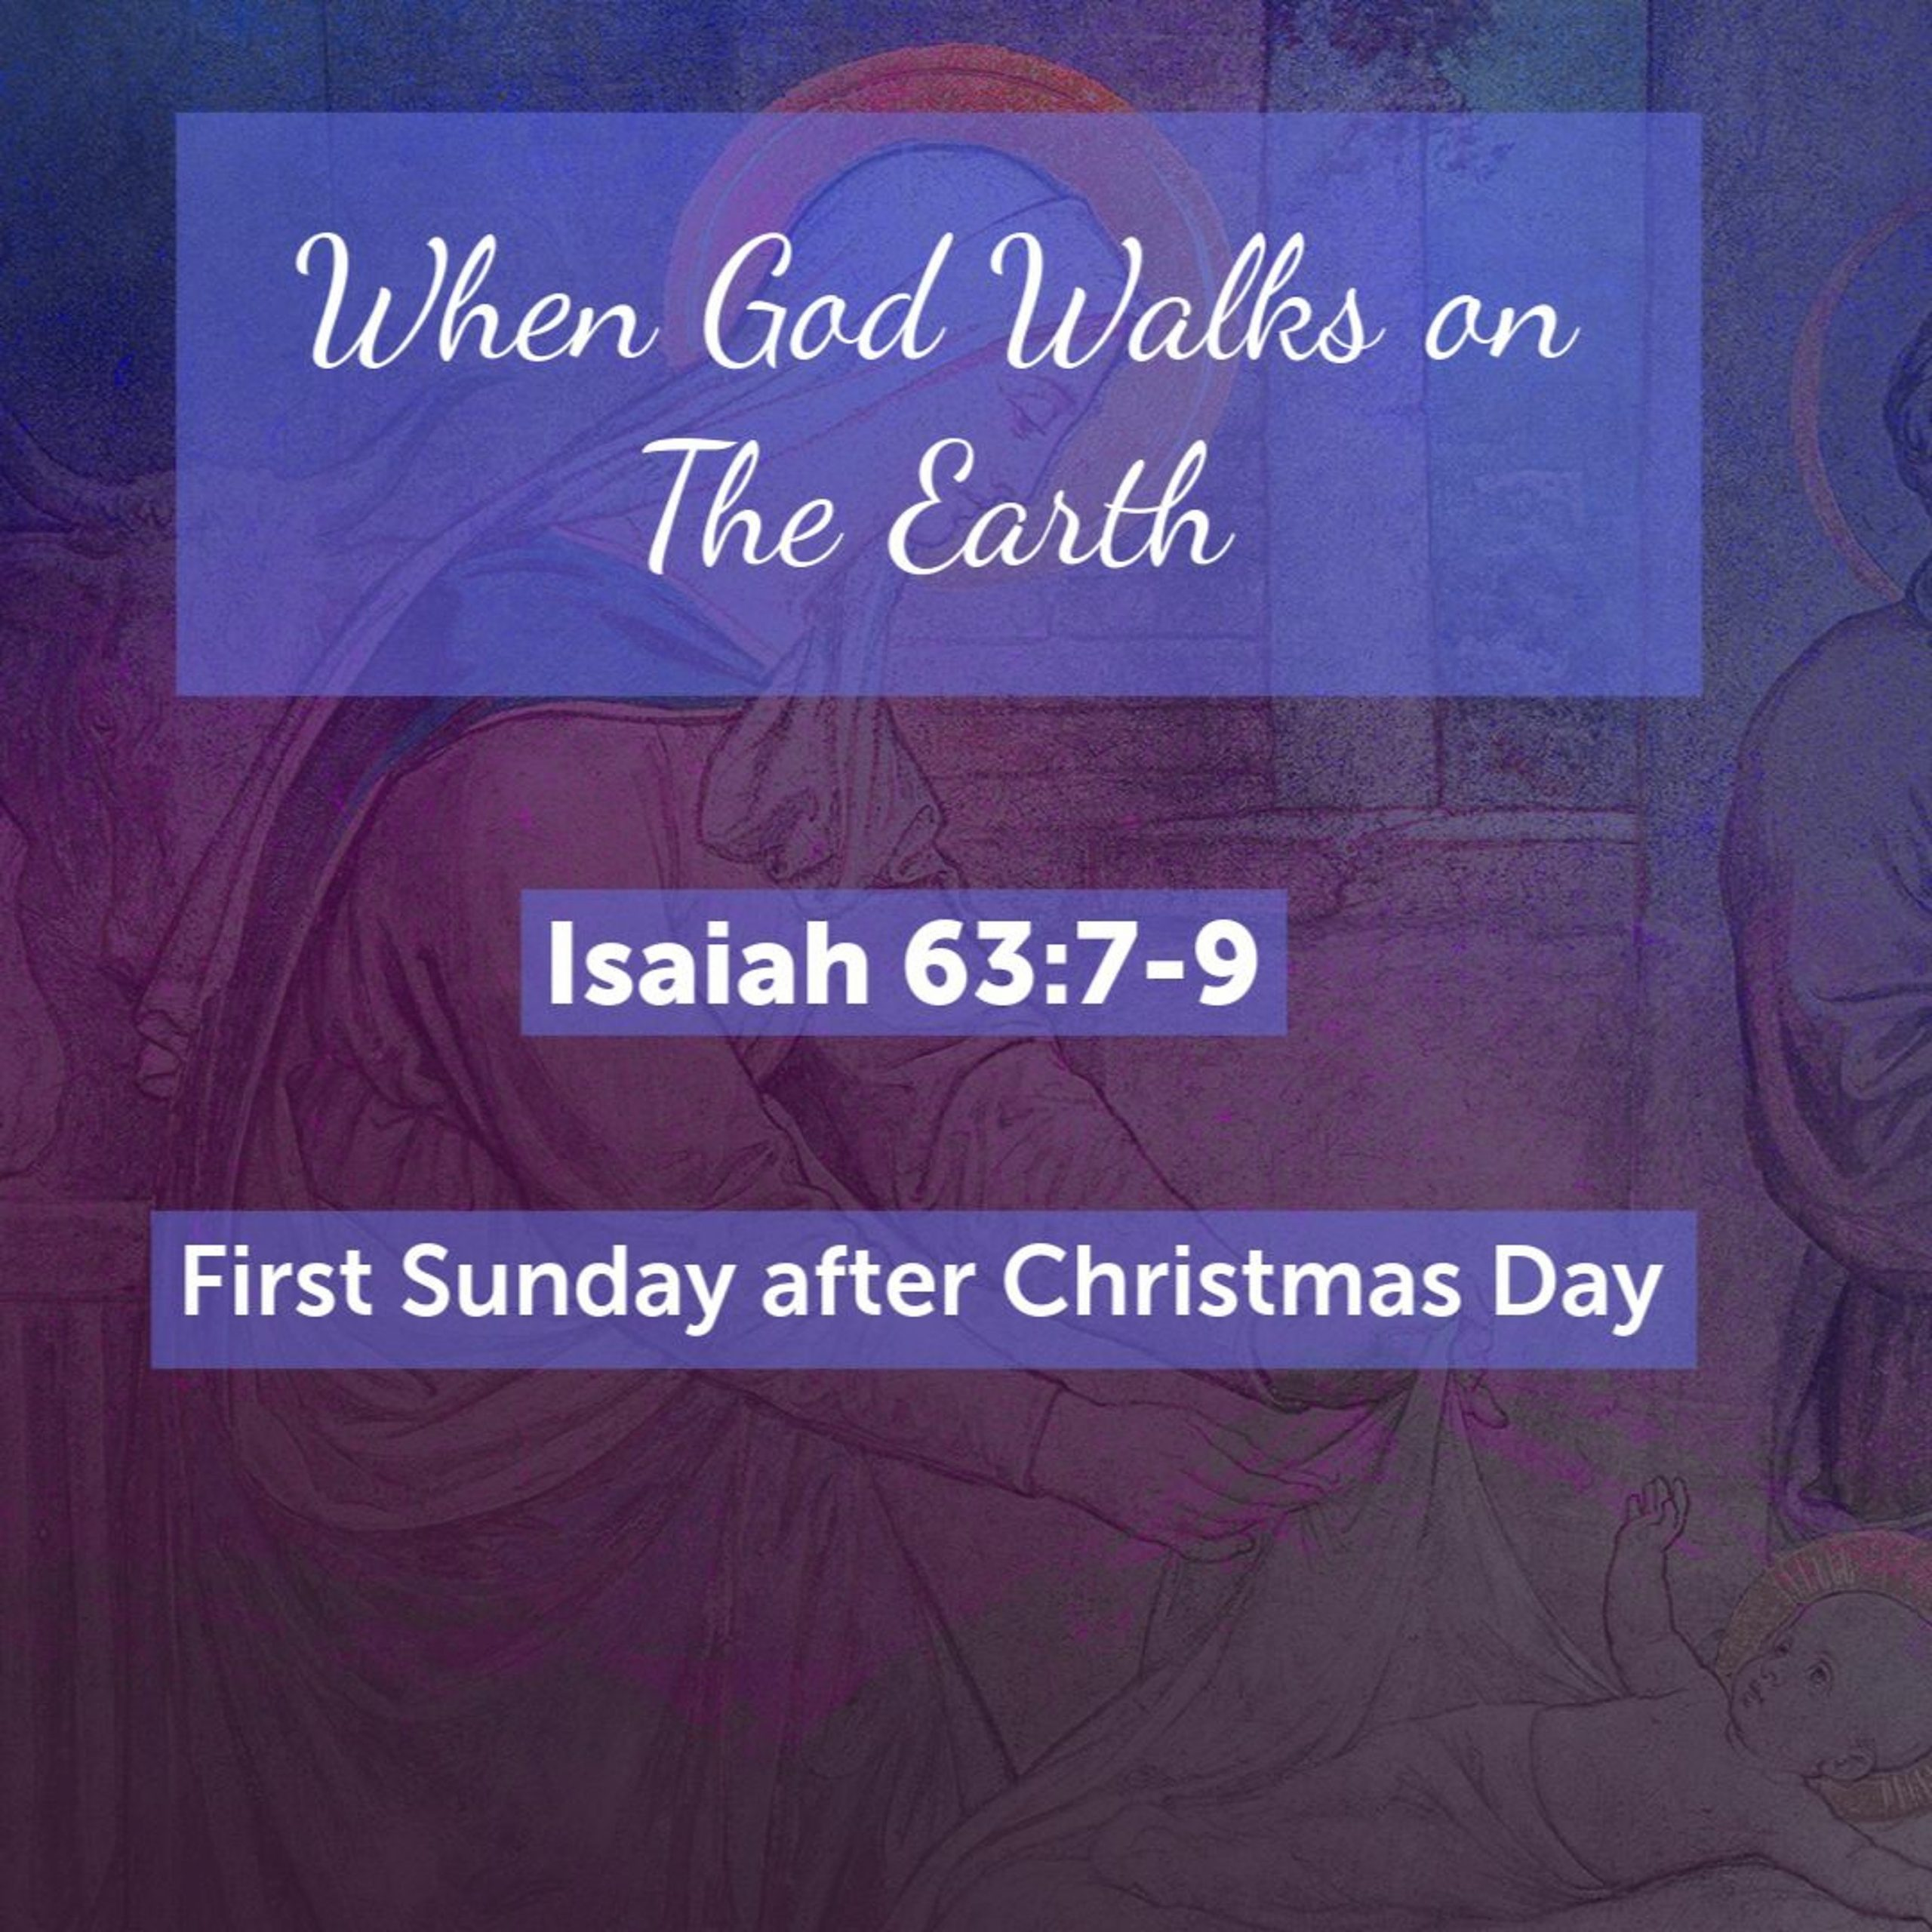 When God Walks on The Earth